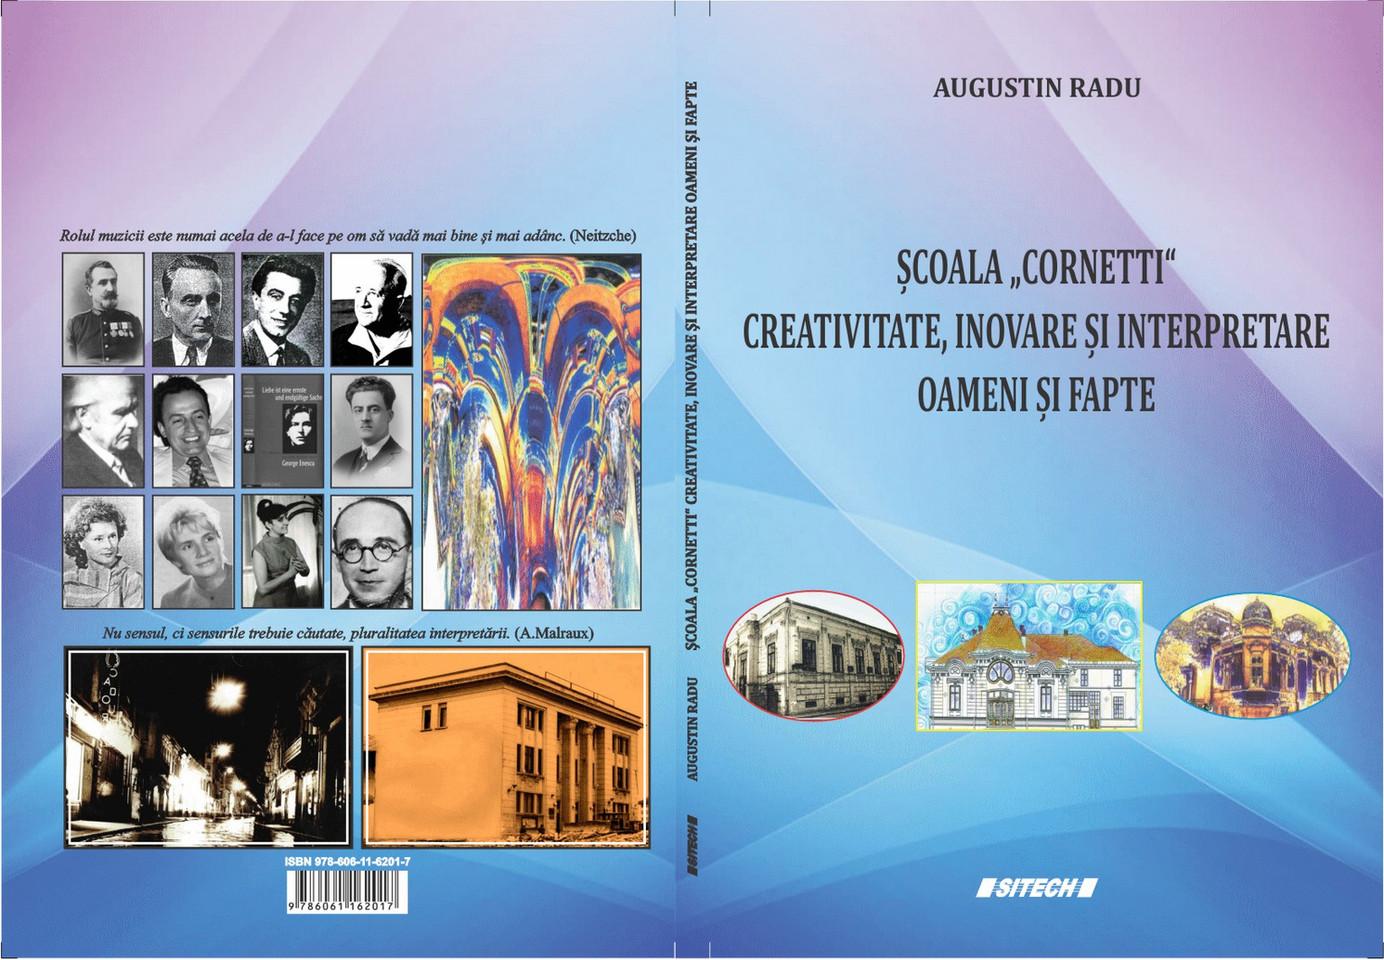 Scoala Cornetti. creativitate, inovare și interpretare. oameni și fapte